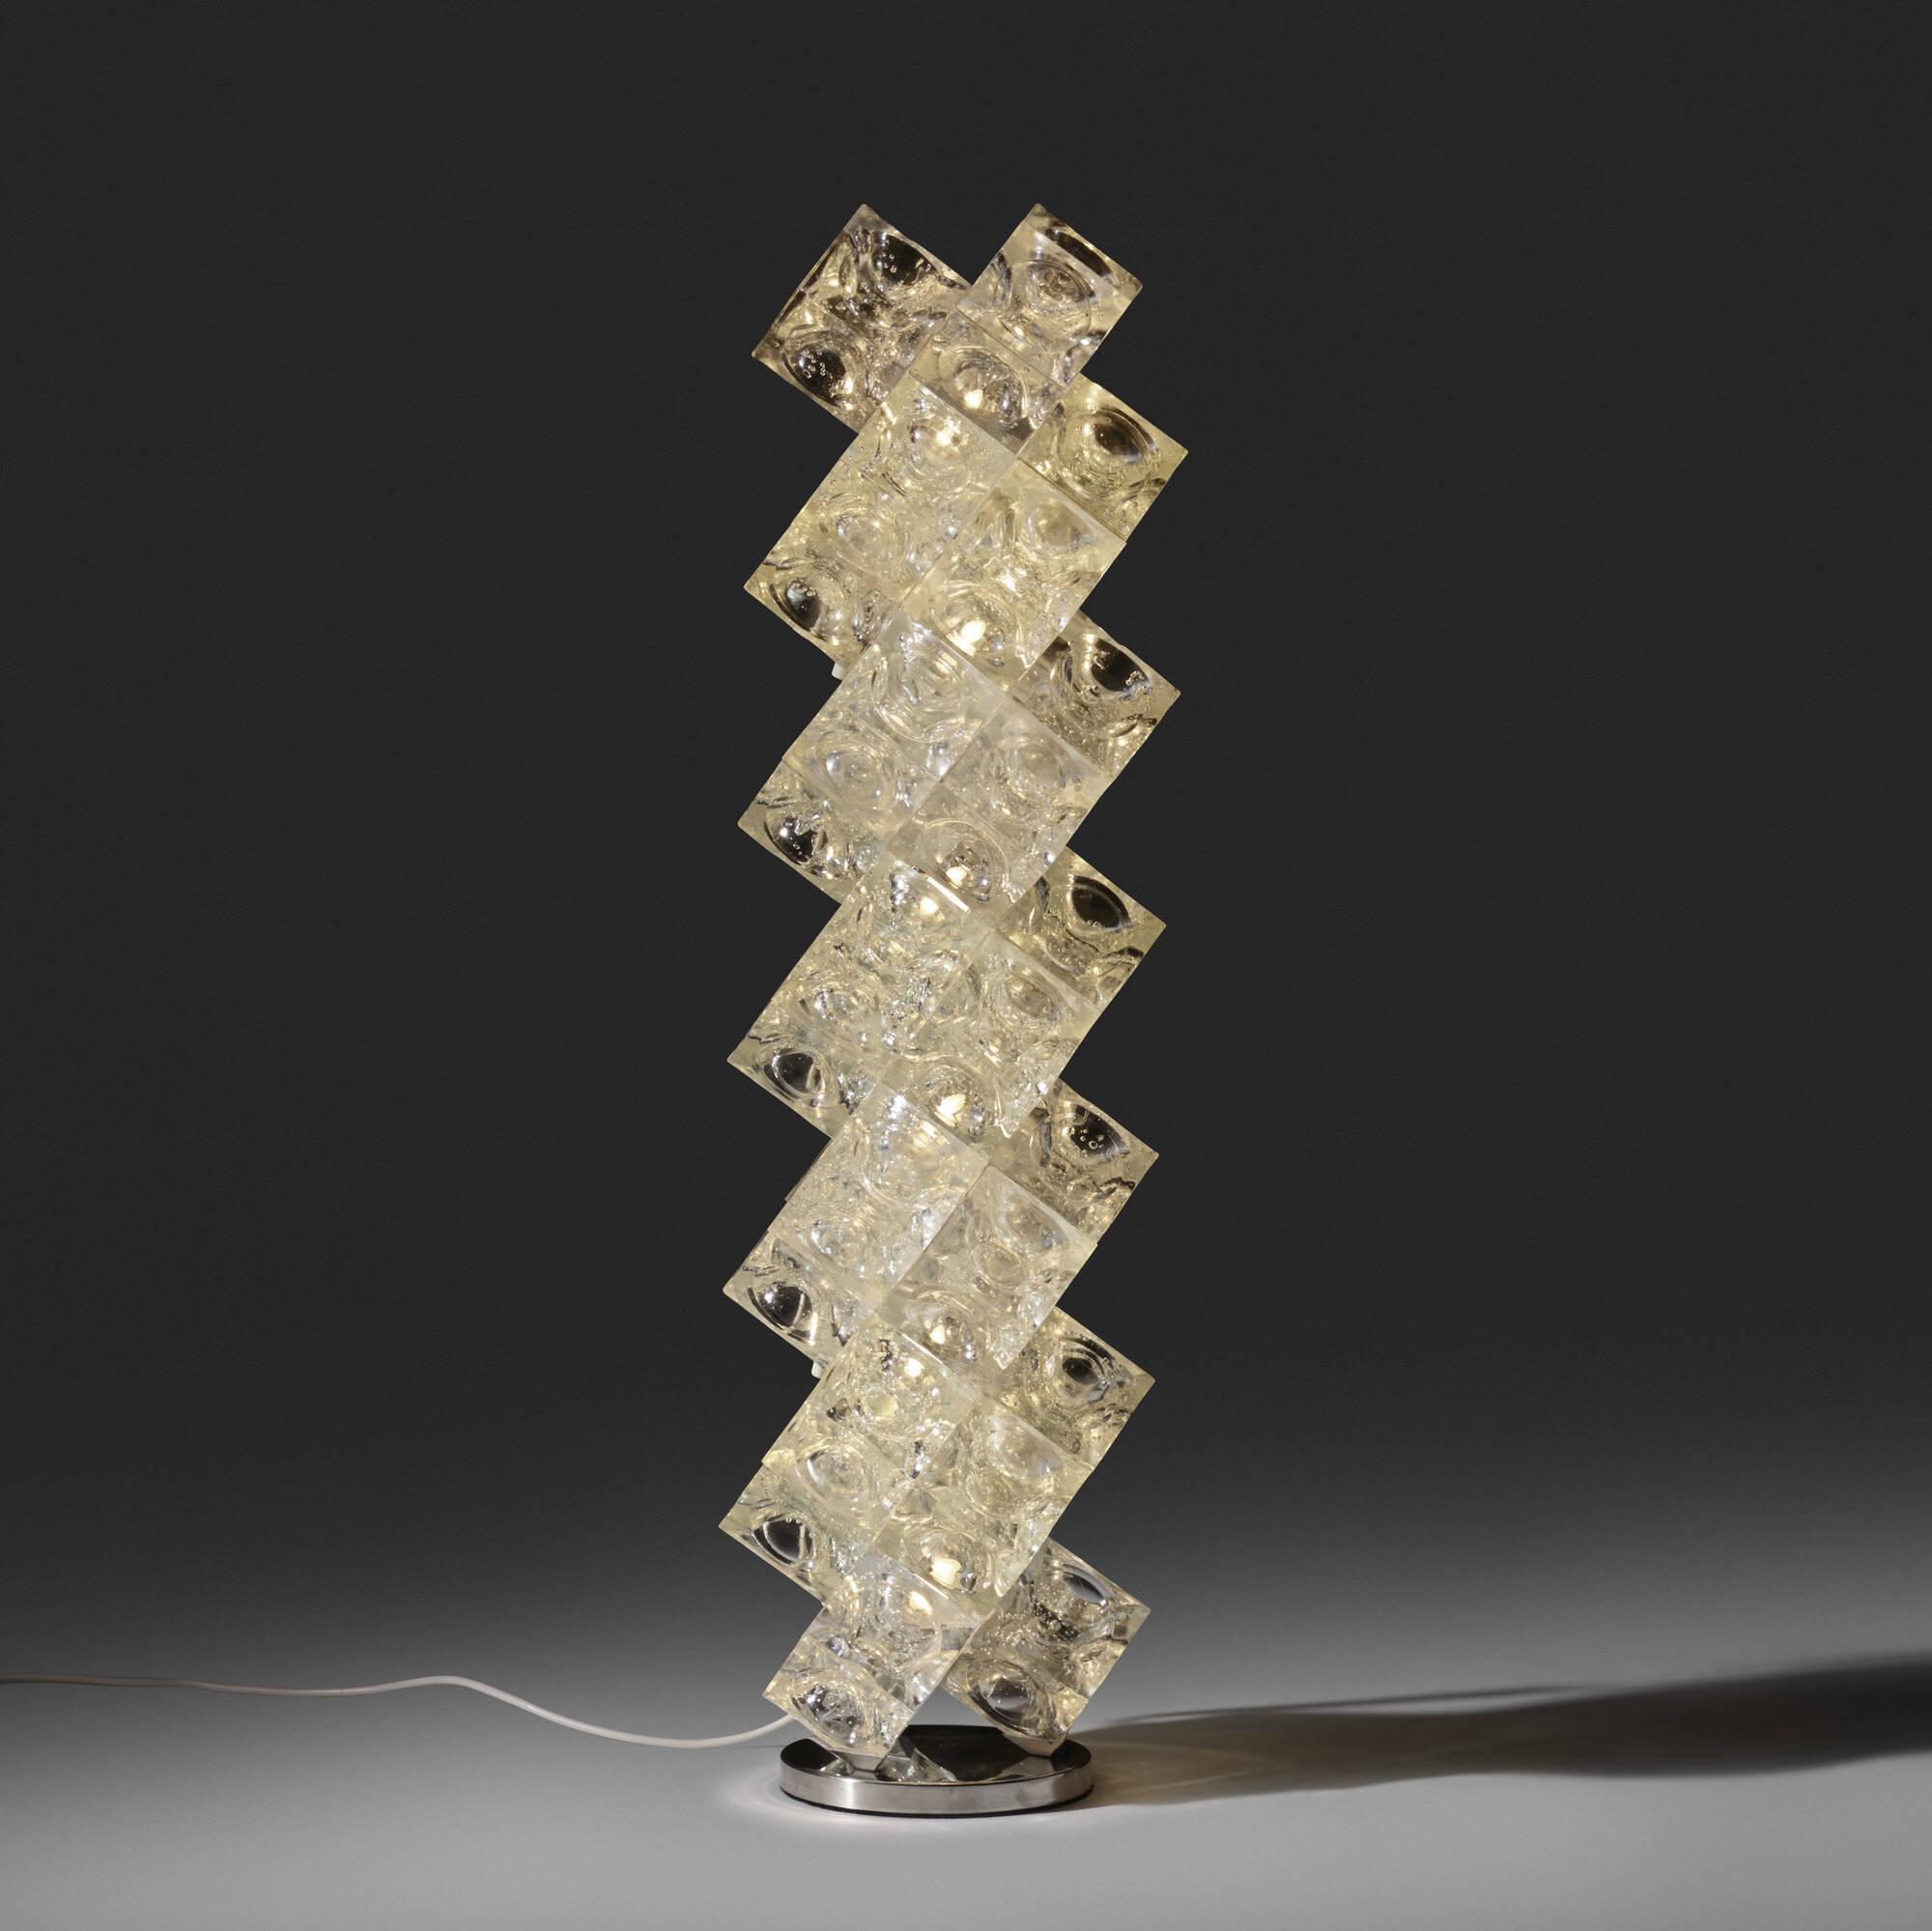 250: Poliarte / rare Saturno standing lamp (2 of 3)